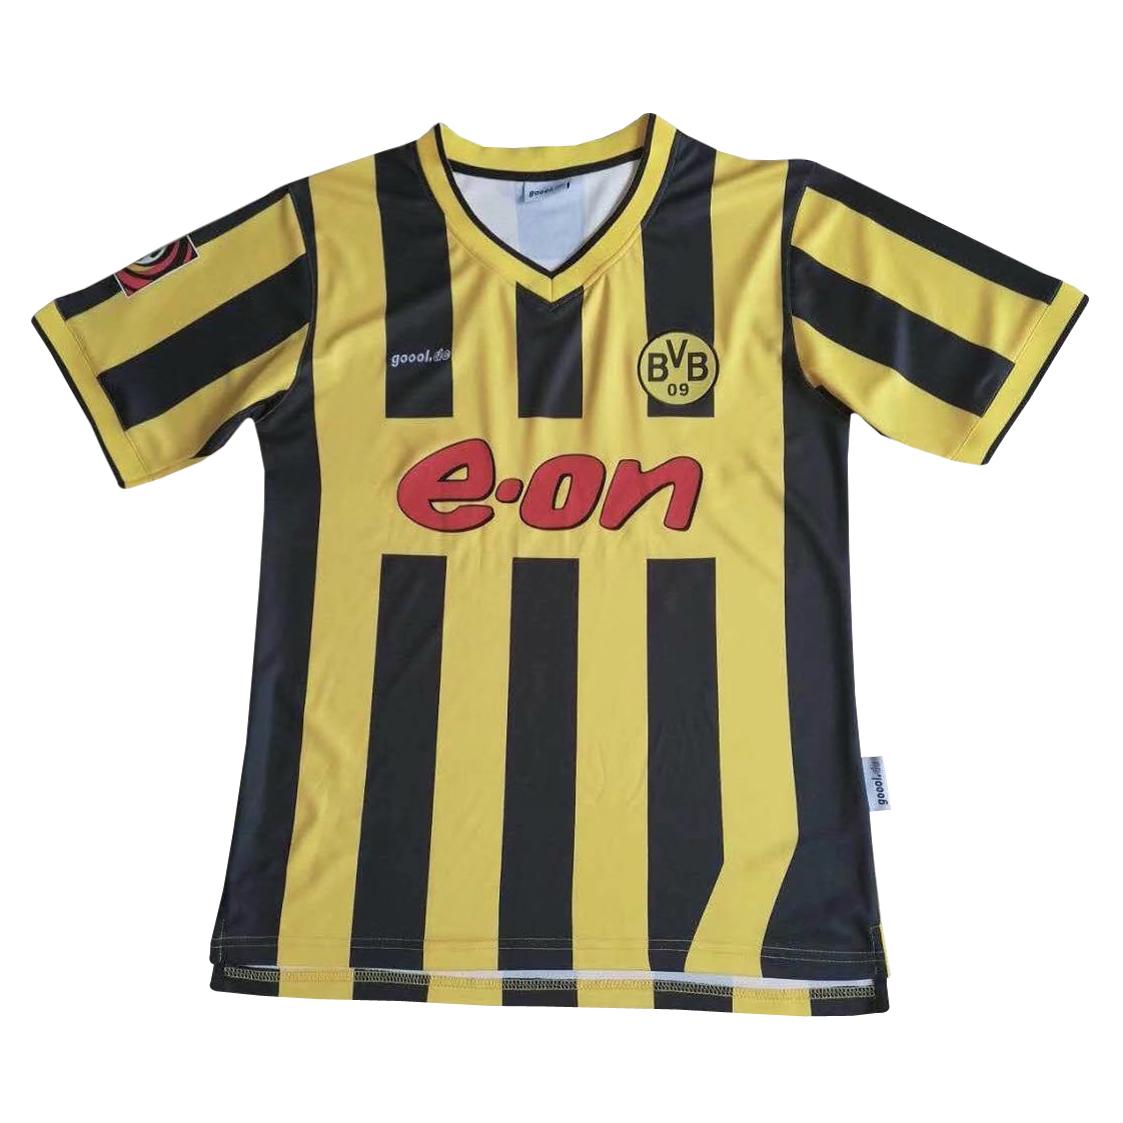 Buy Classic Retro Vintage Dortmund Football Shirts/Soccer Jerseys ...